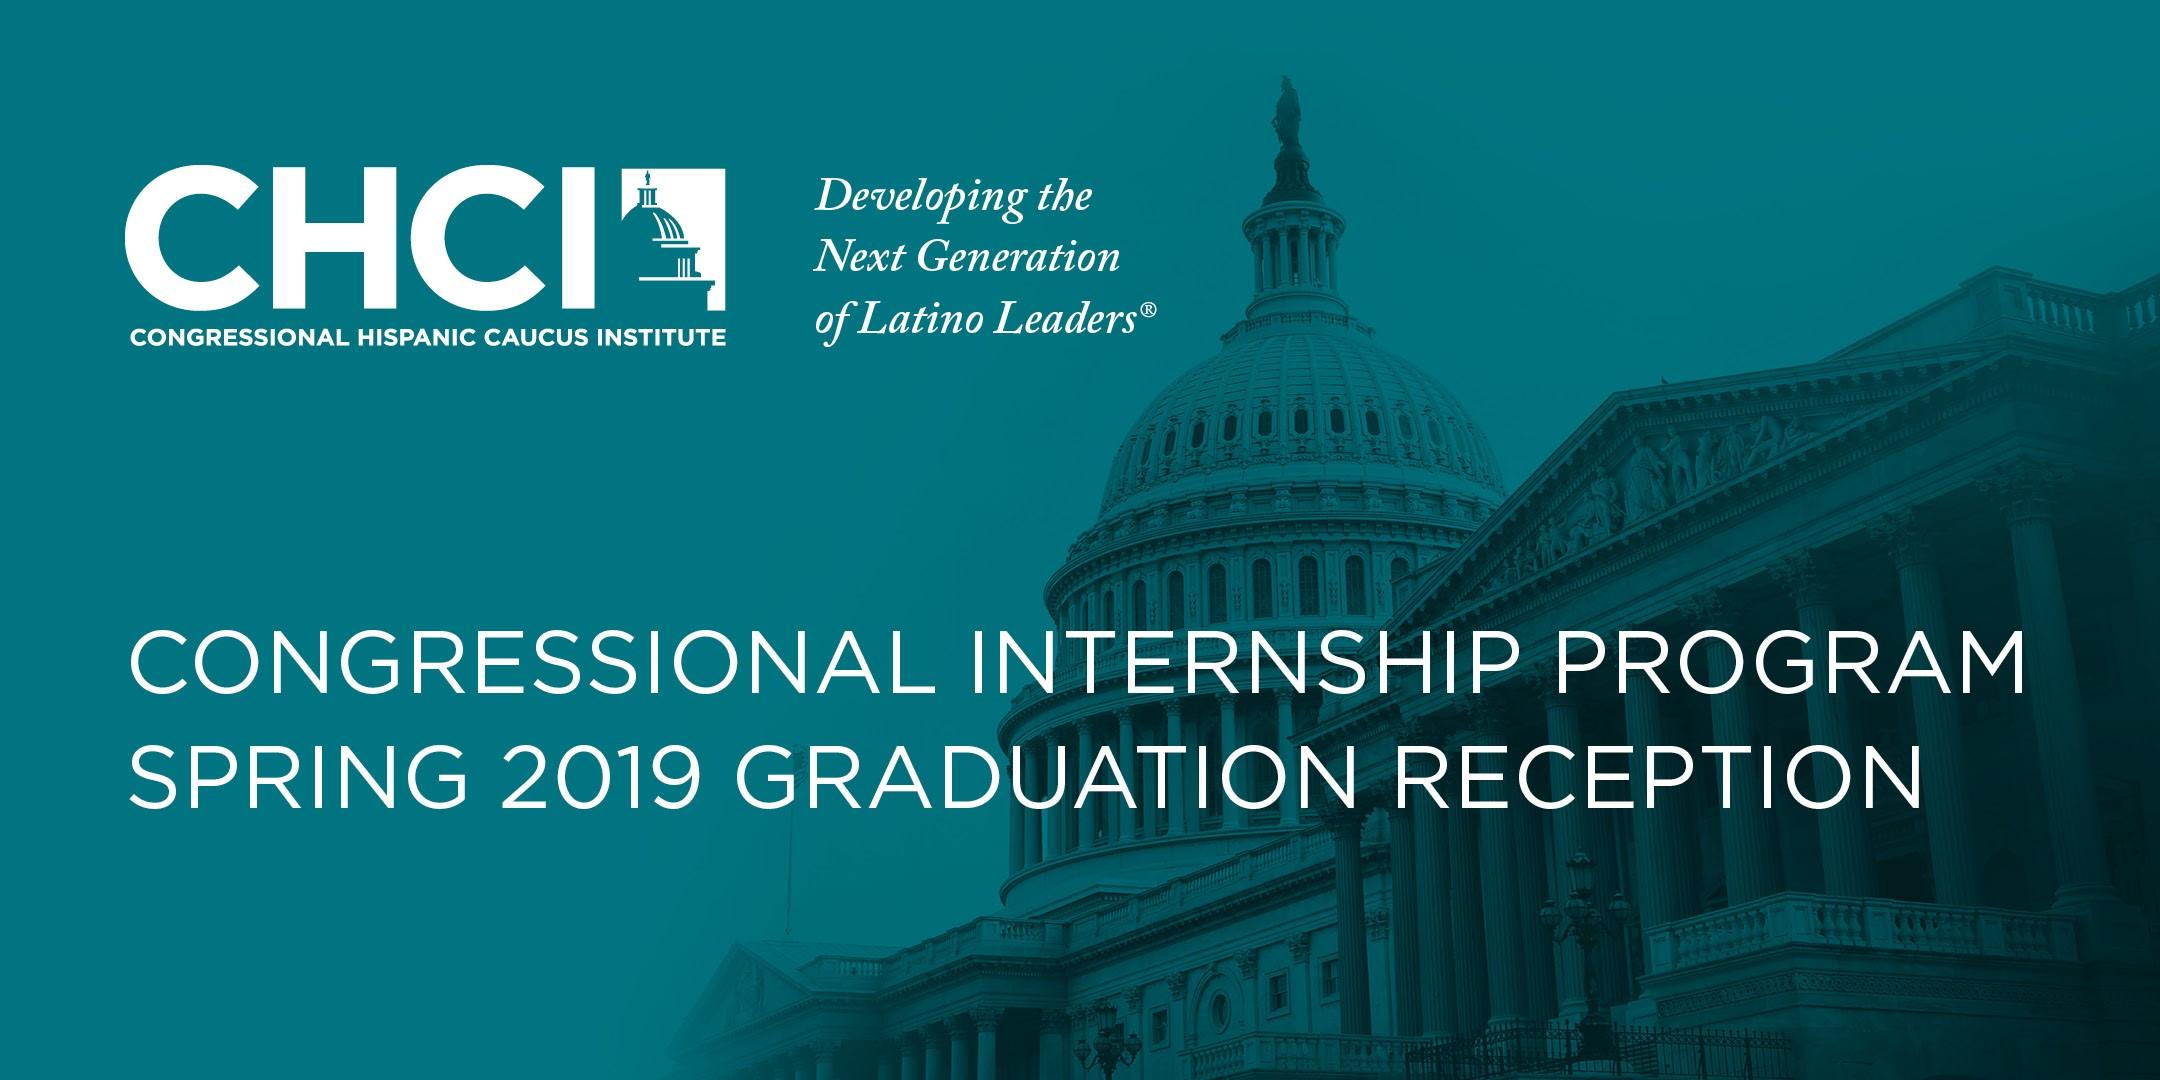 CHCI 2019 Spring Congressional Internship Program Graduation & Reception